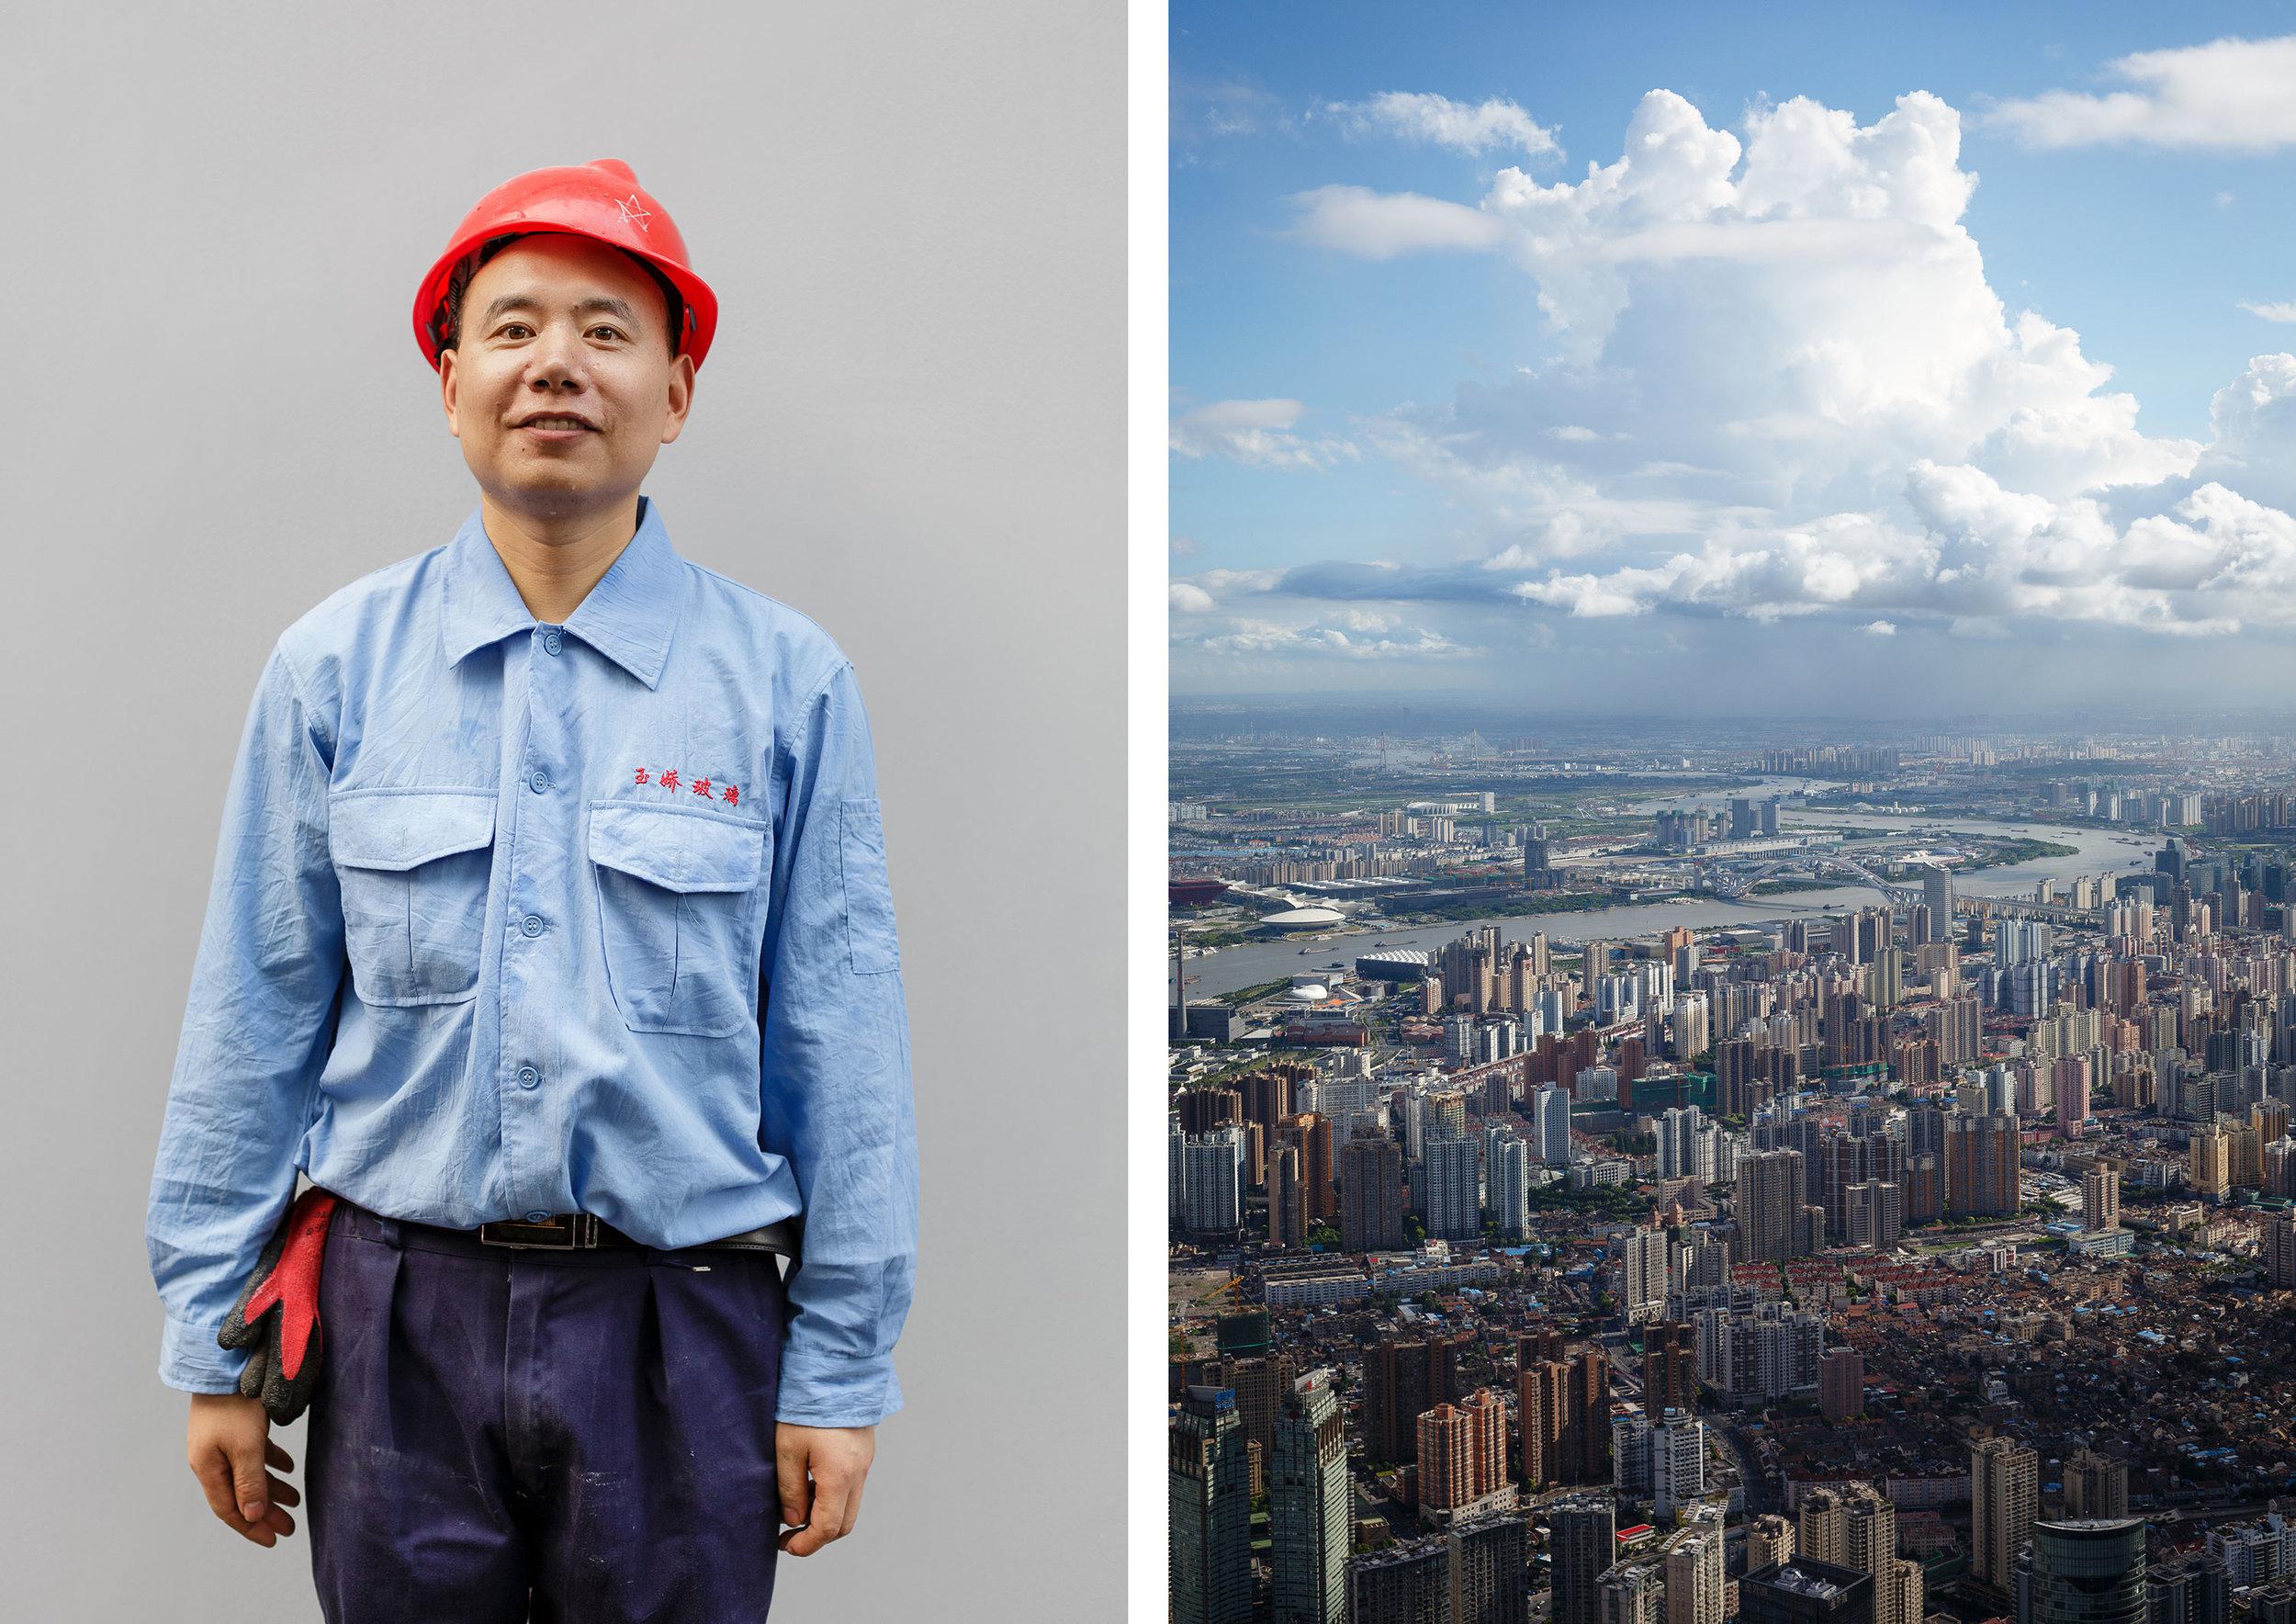 Shanghai_Tower-workers-and-building21.jpg